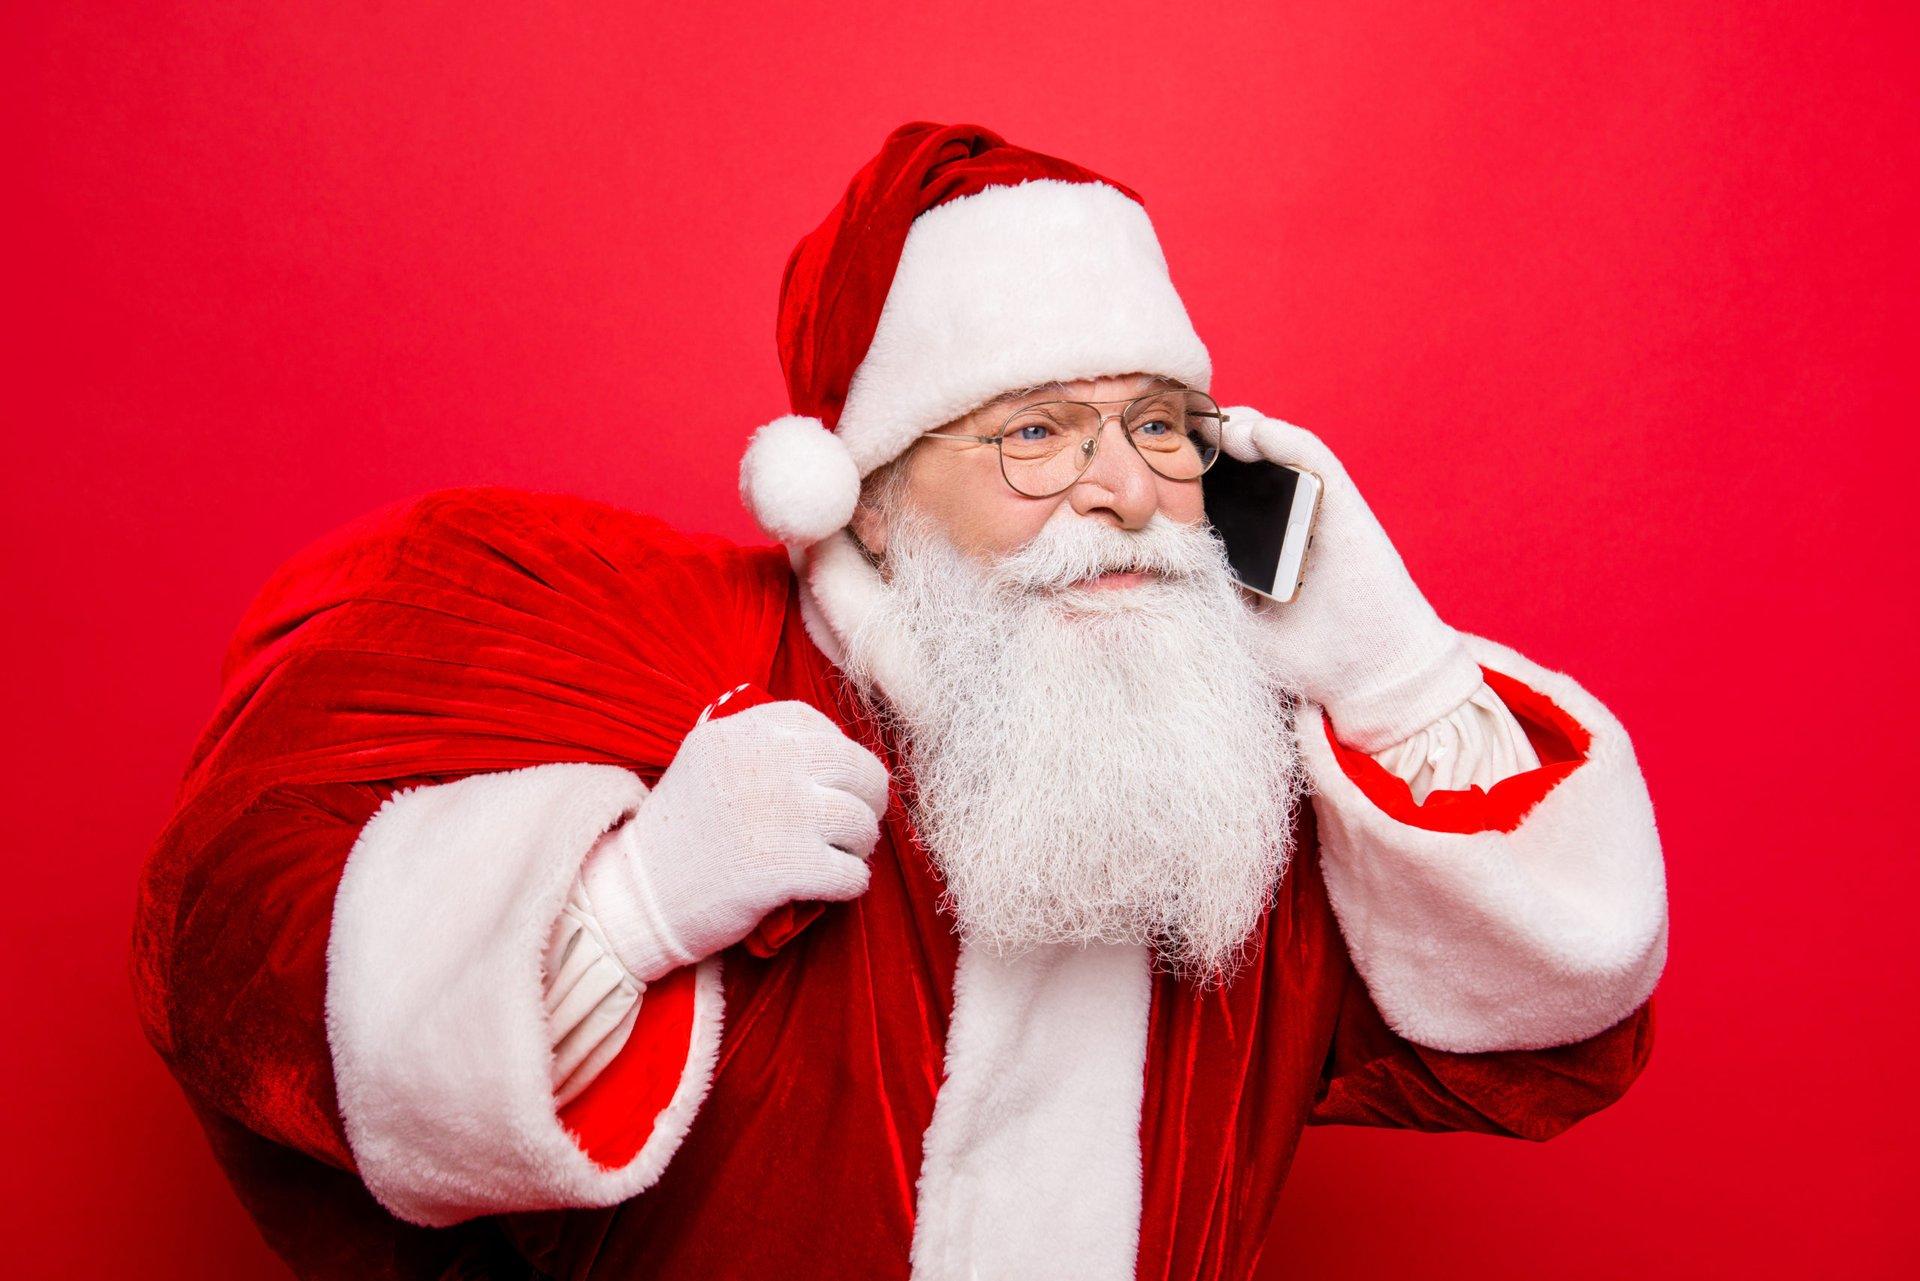 Santa talking on his smartphone